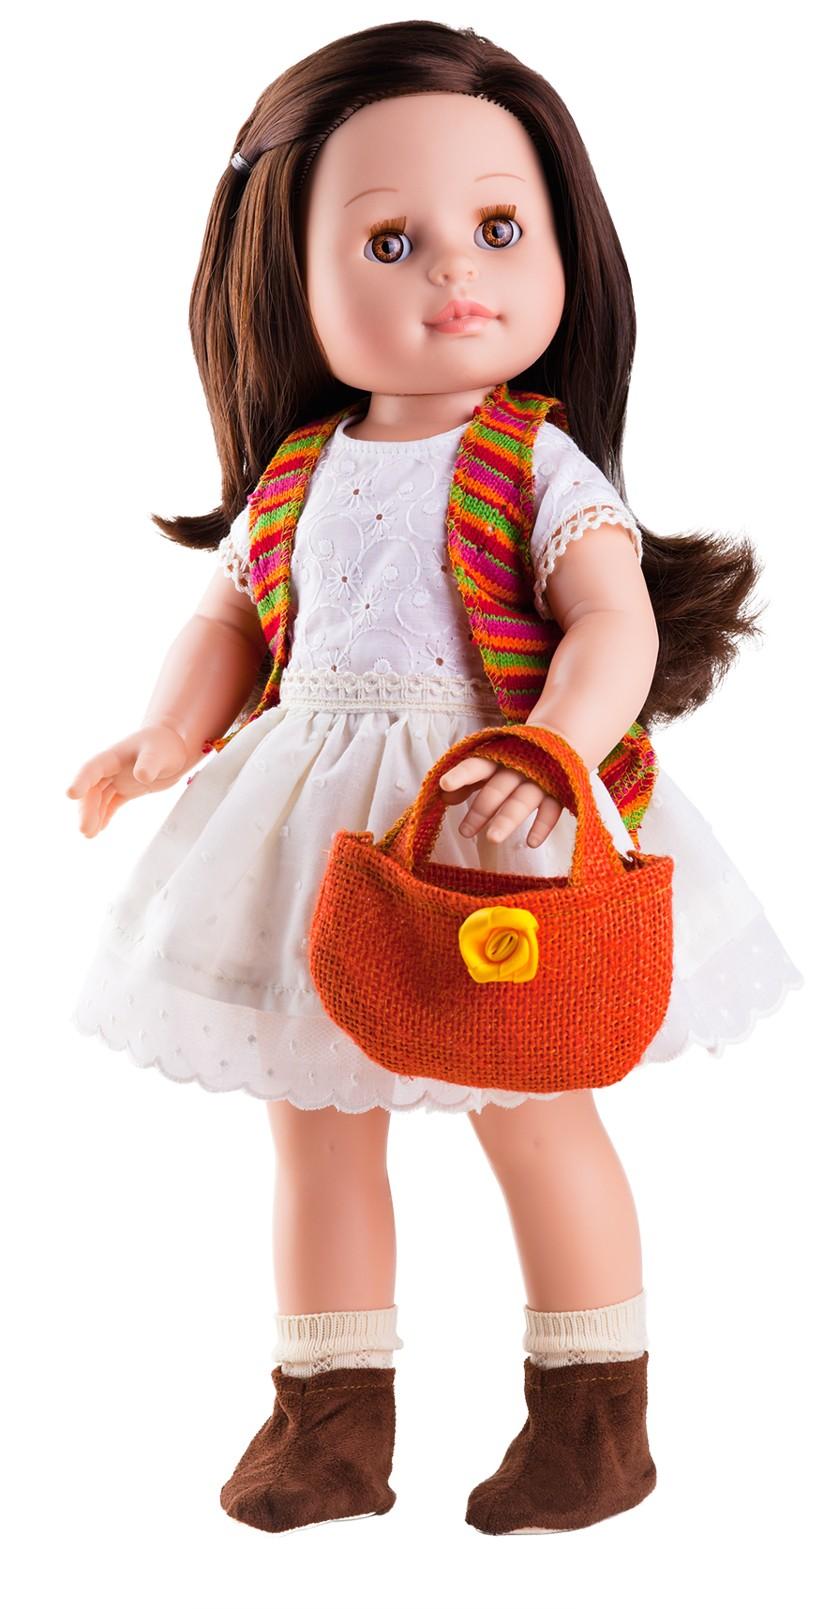 Realistická panenka Emily s červenou taškou od f. Paola Reina